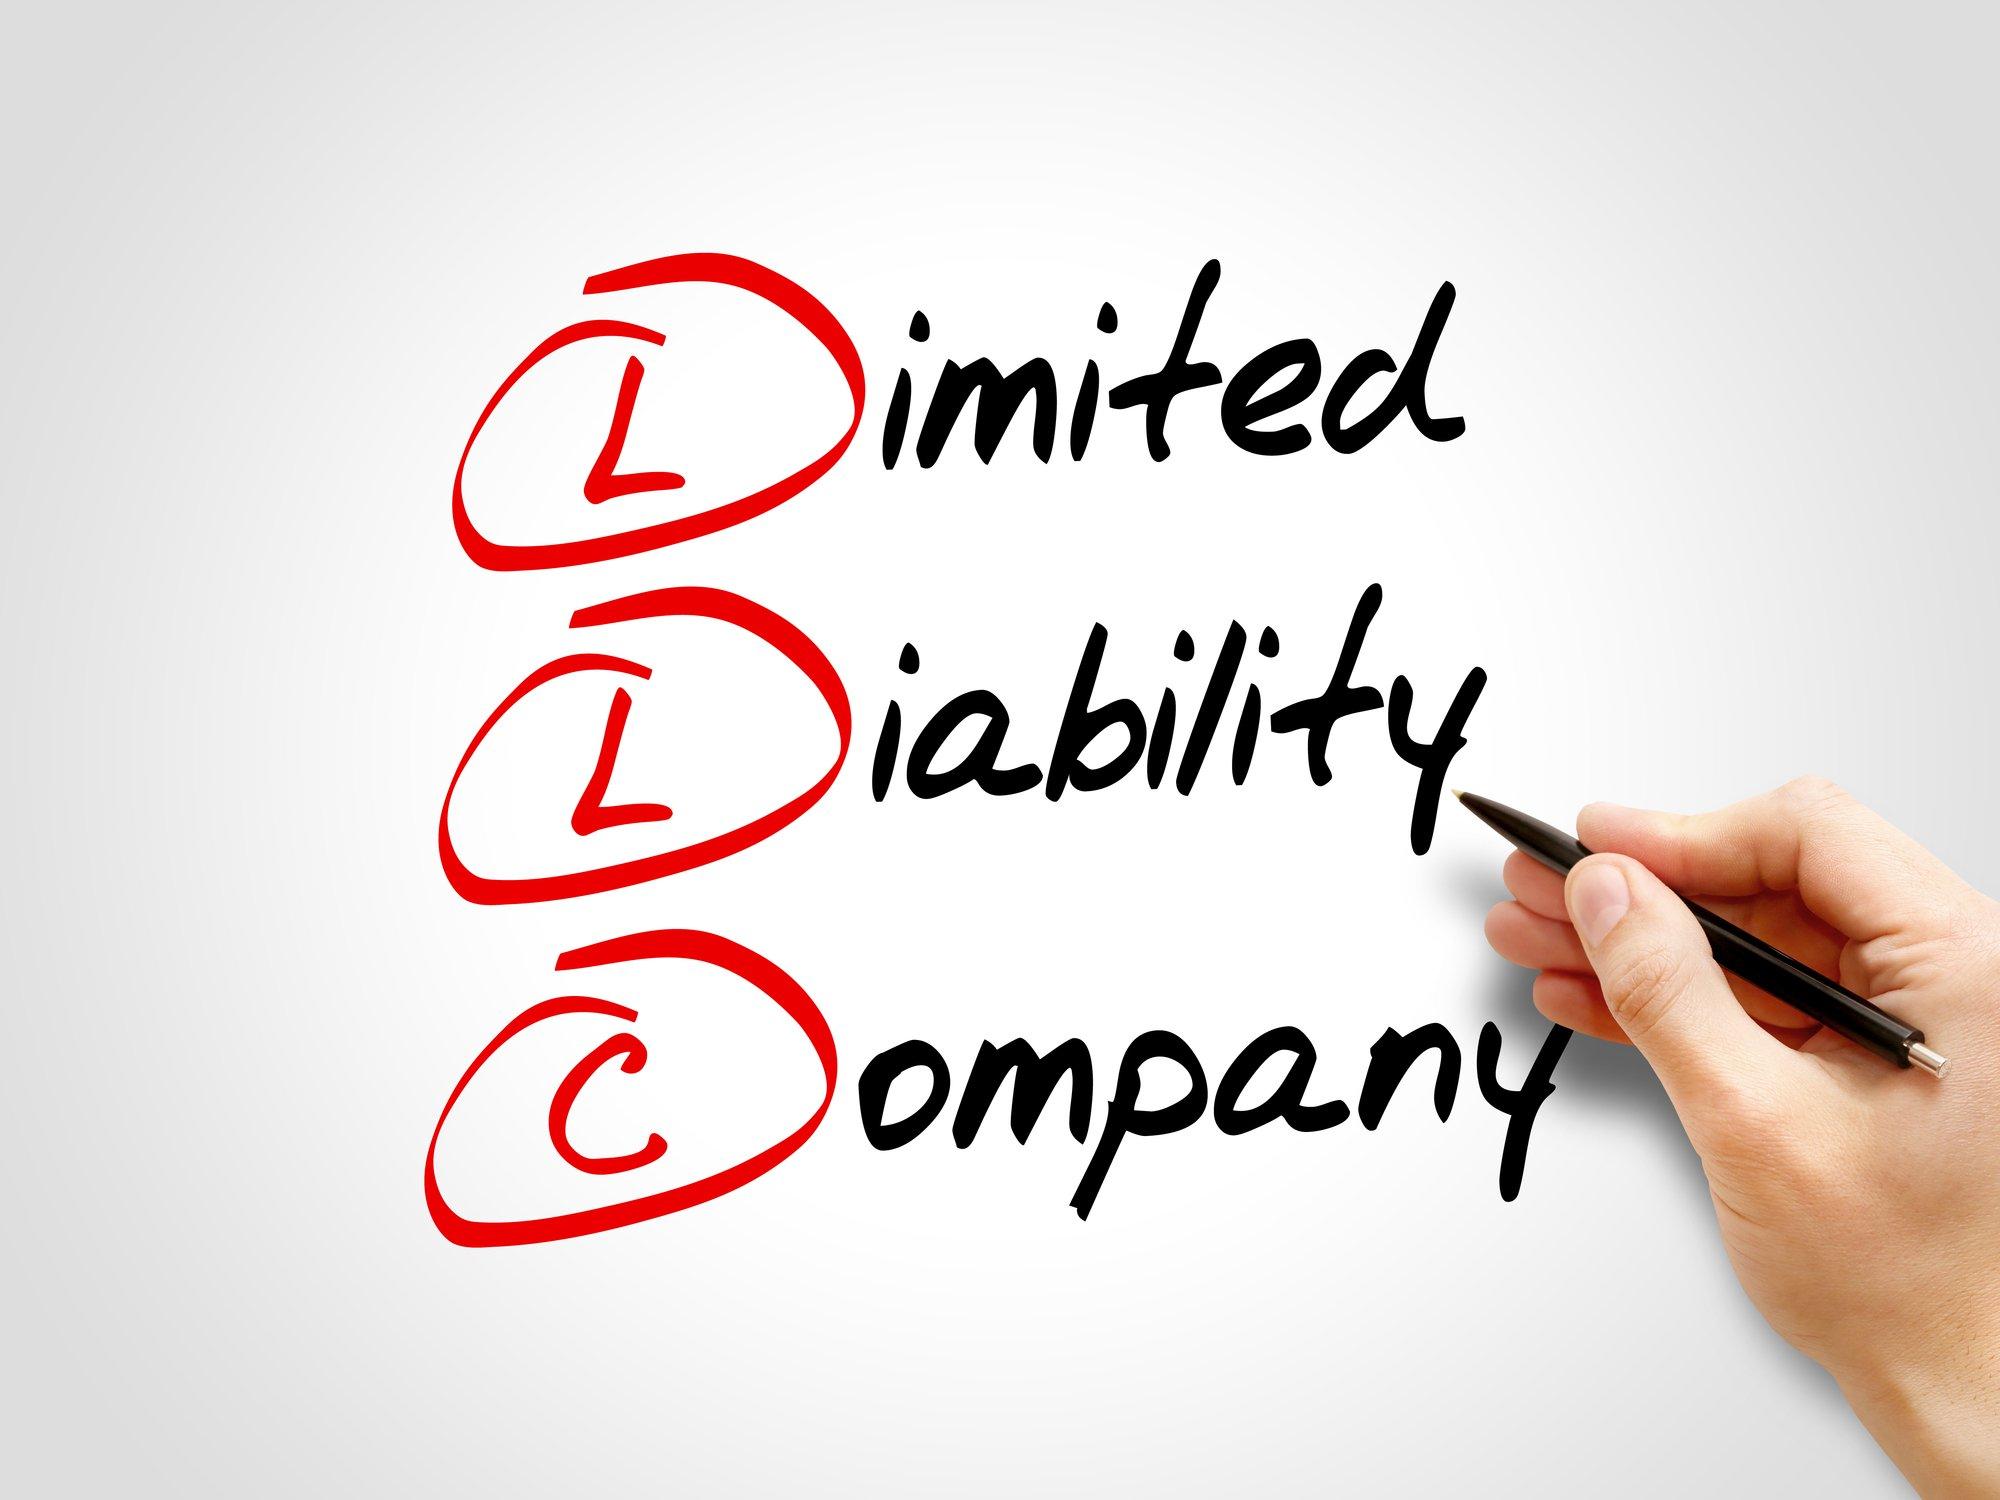 LLC - Limited Liability Company